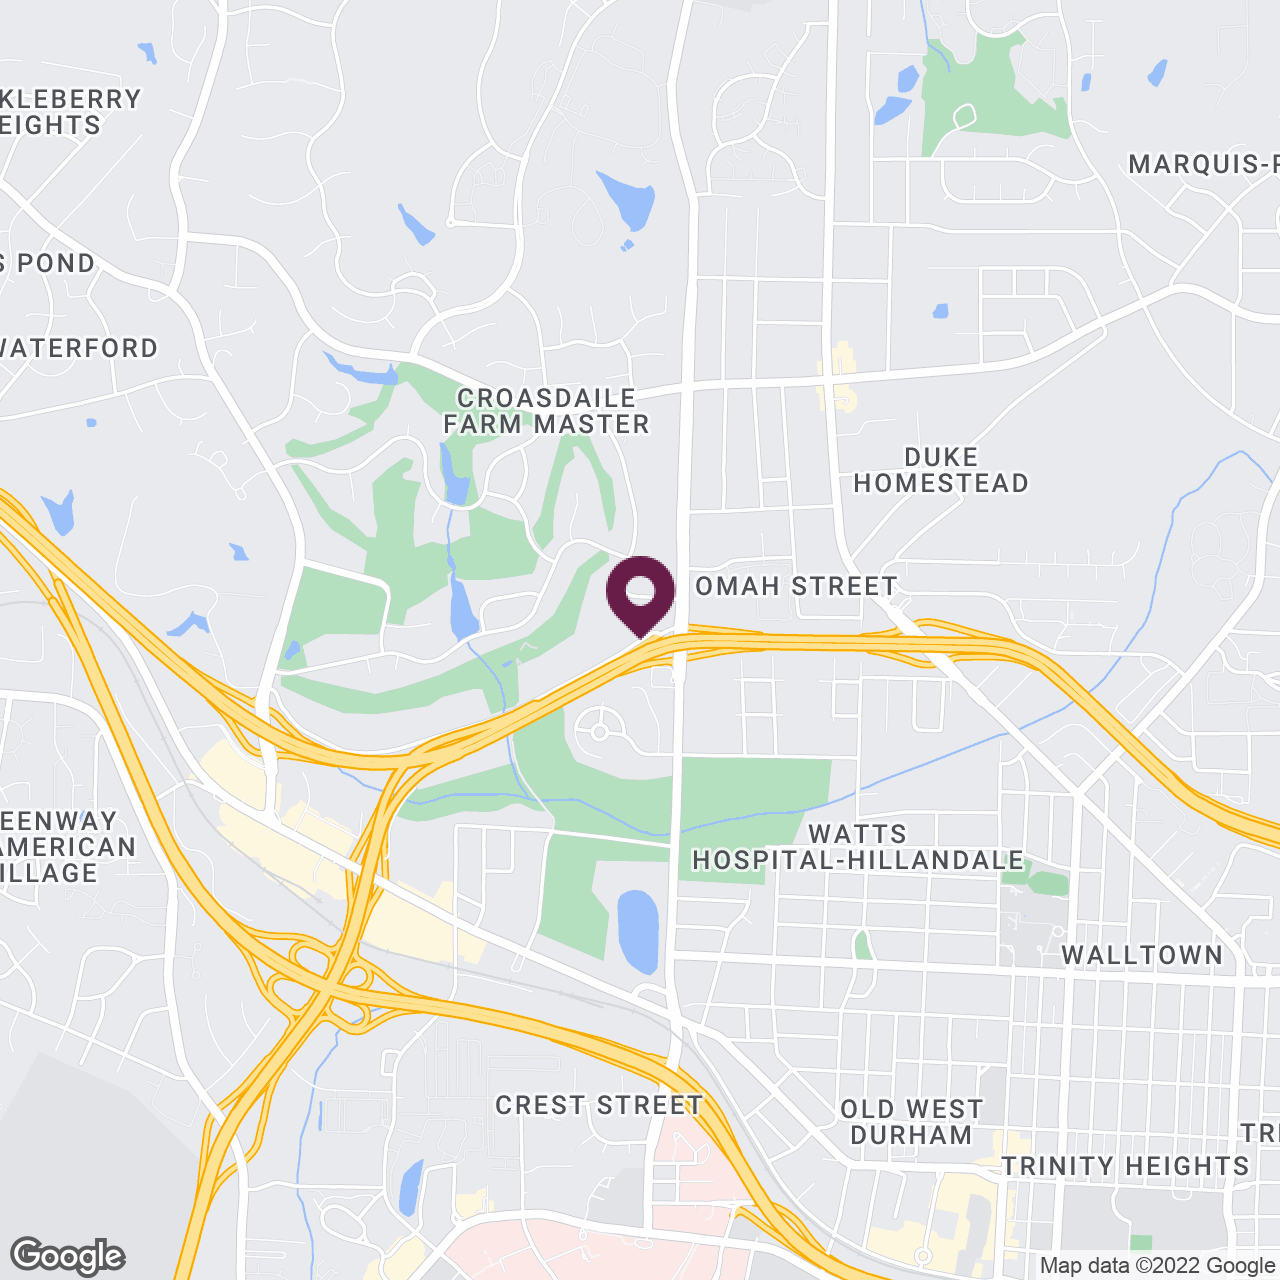 Google Maps static image of Durham, North Carolina